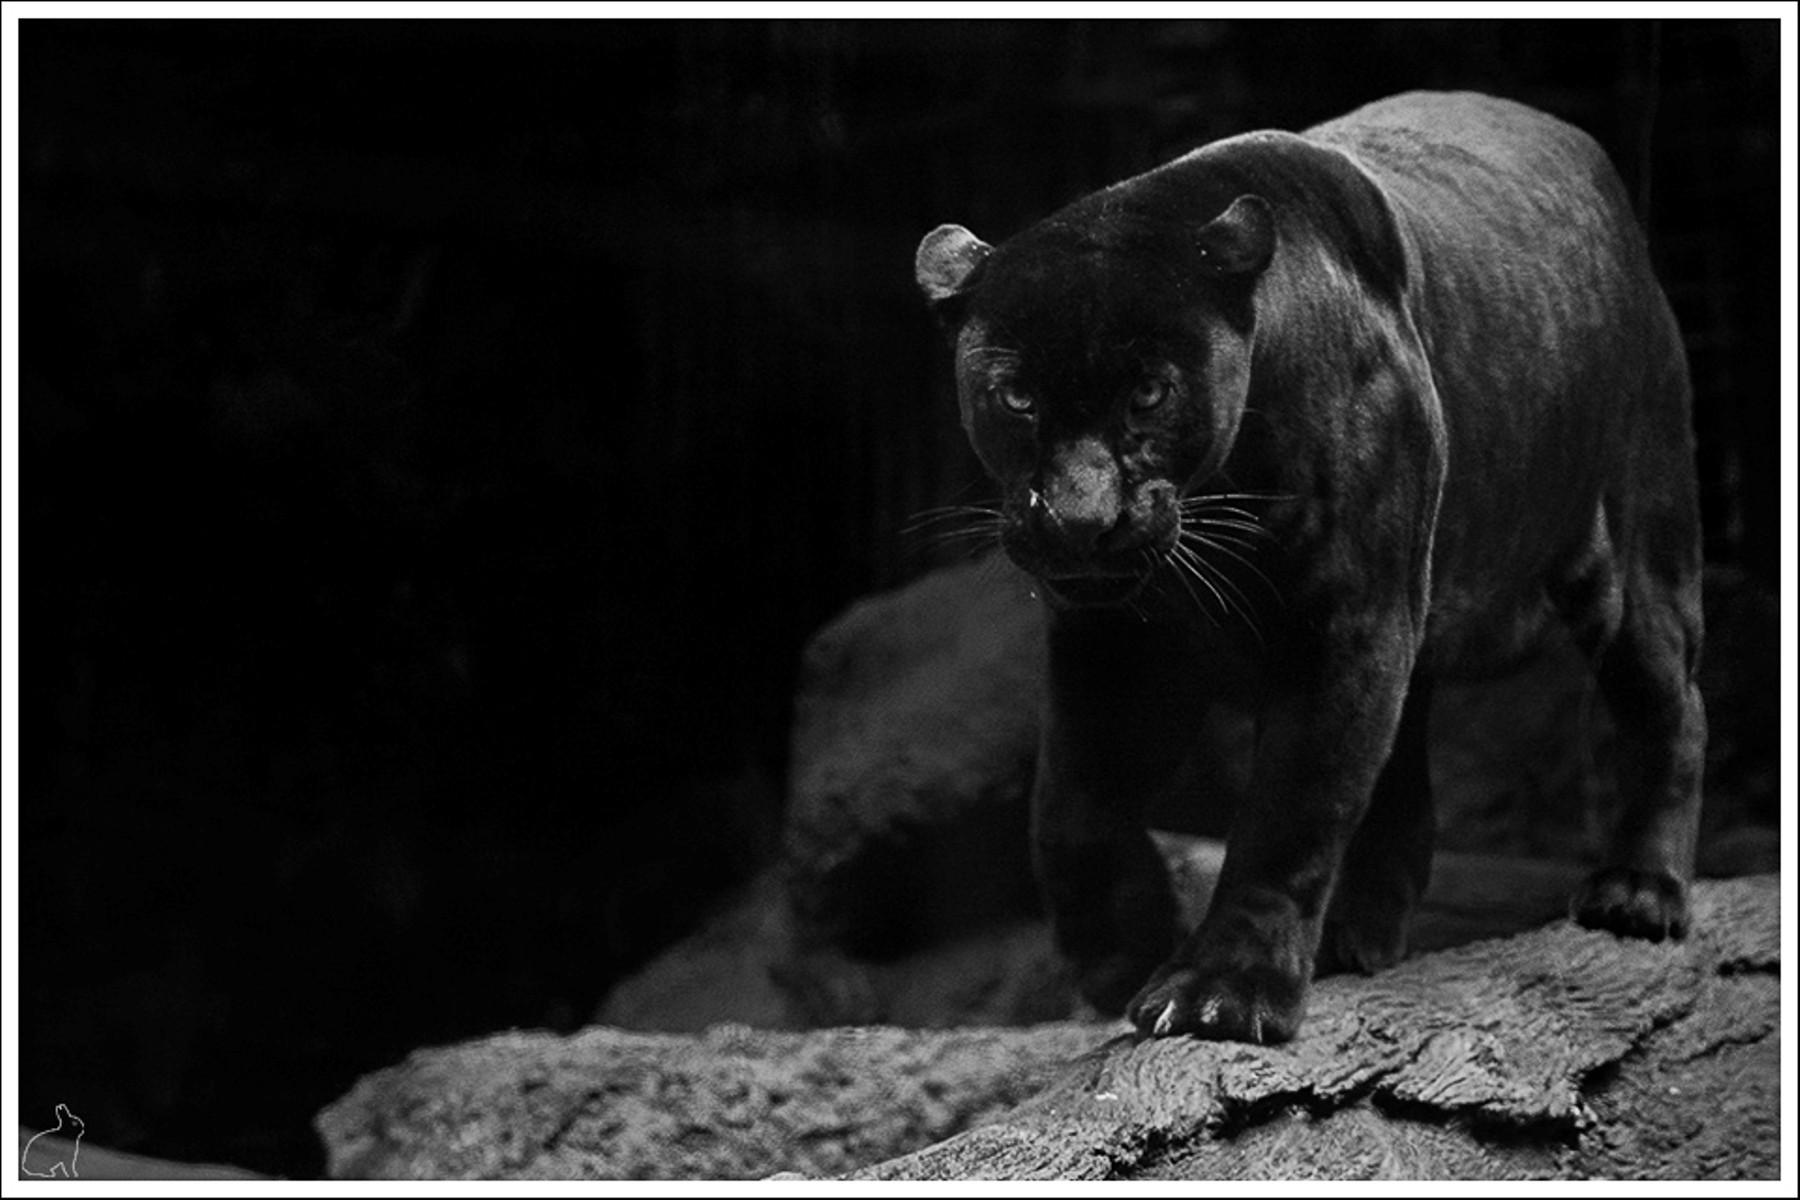 Black Jaguar Wallpaper Animal Pictures Black Jaguar Wallpaper 1800x1200